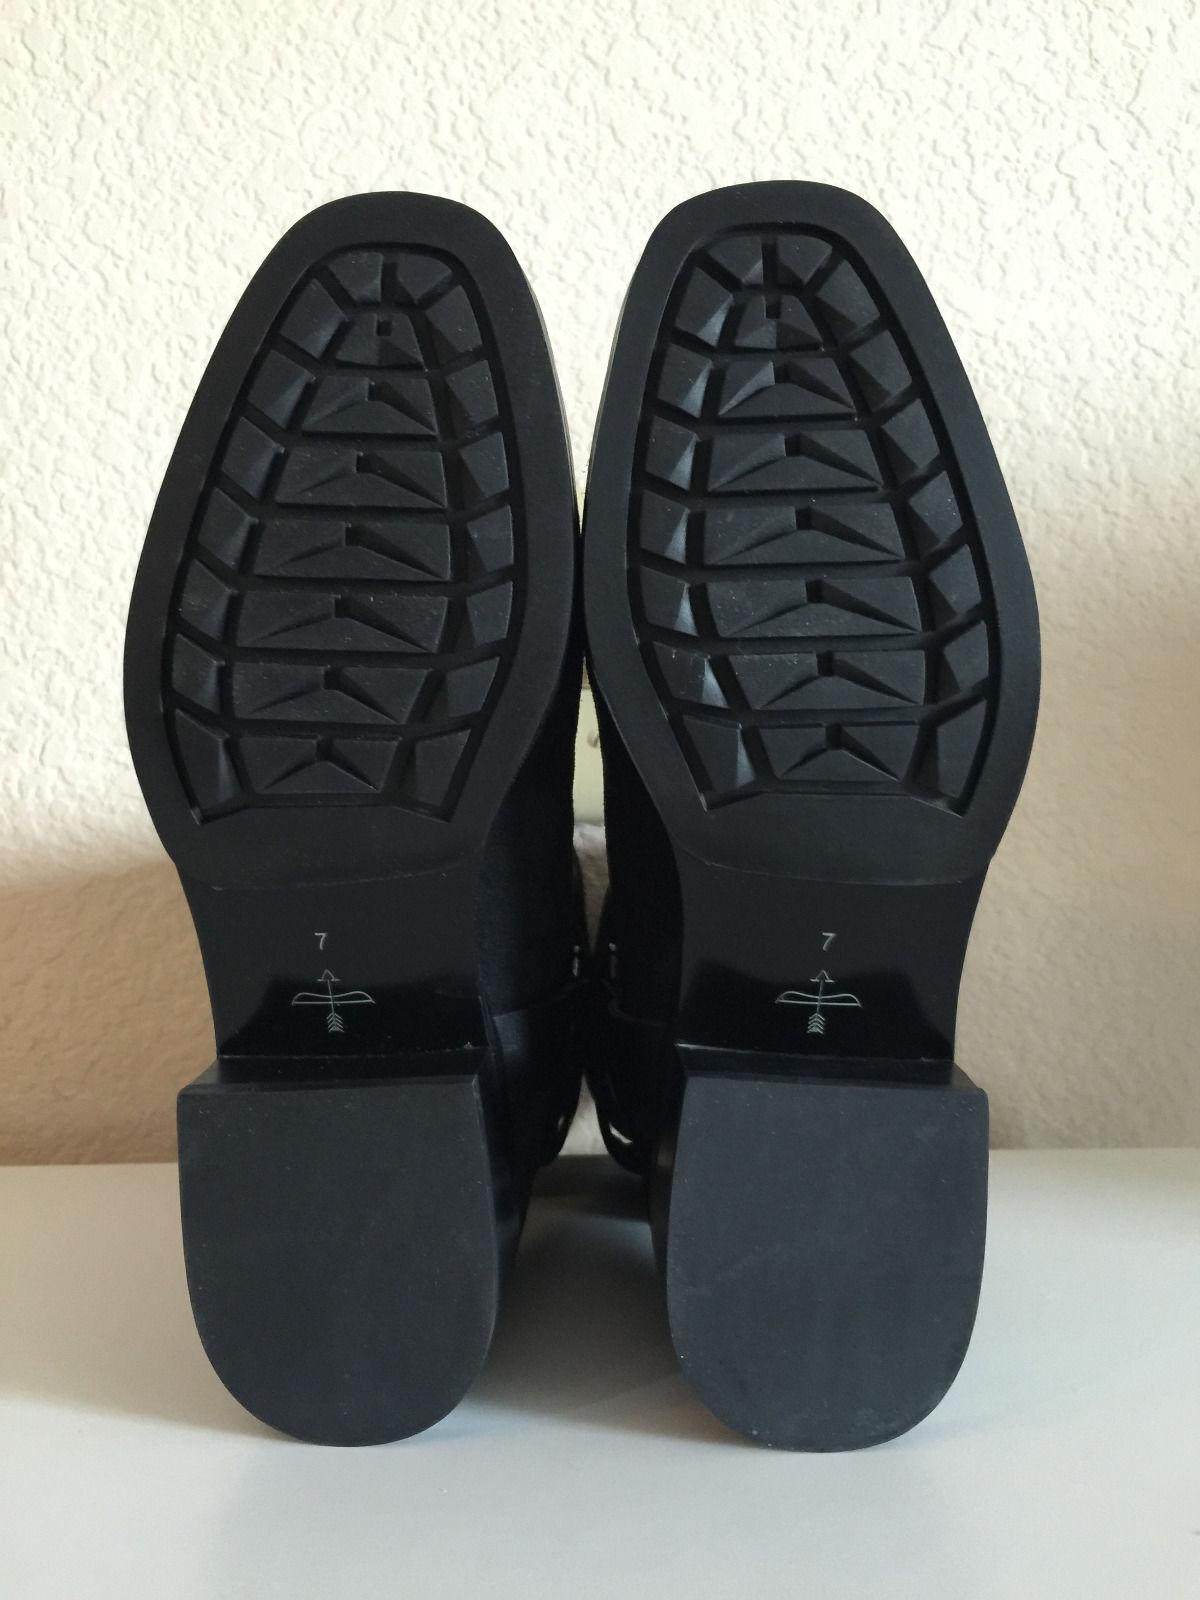 Pour La Victoire Riley Mujer  325. Arnés Arnés 325. De Gamuza Biker Corto botas Zapatos 5.5 a2e9fc